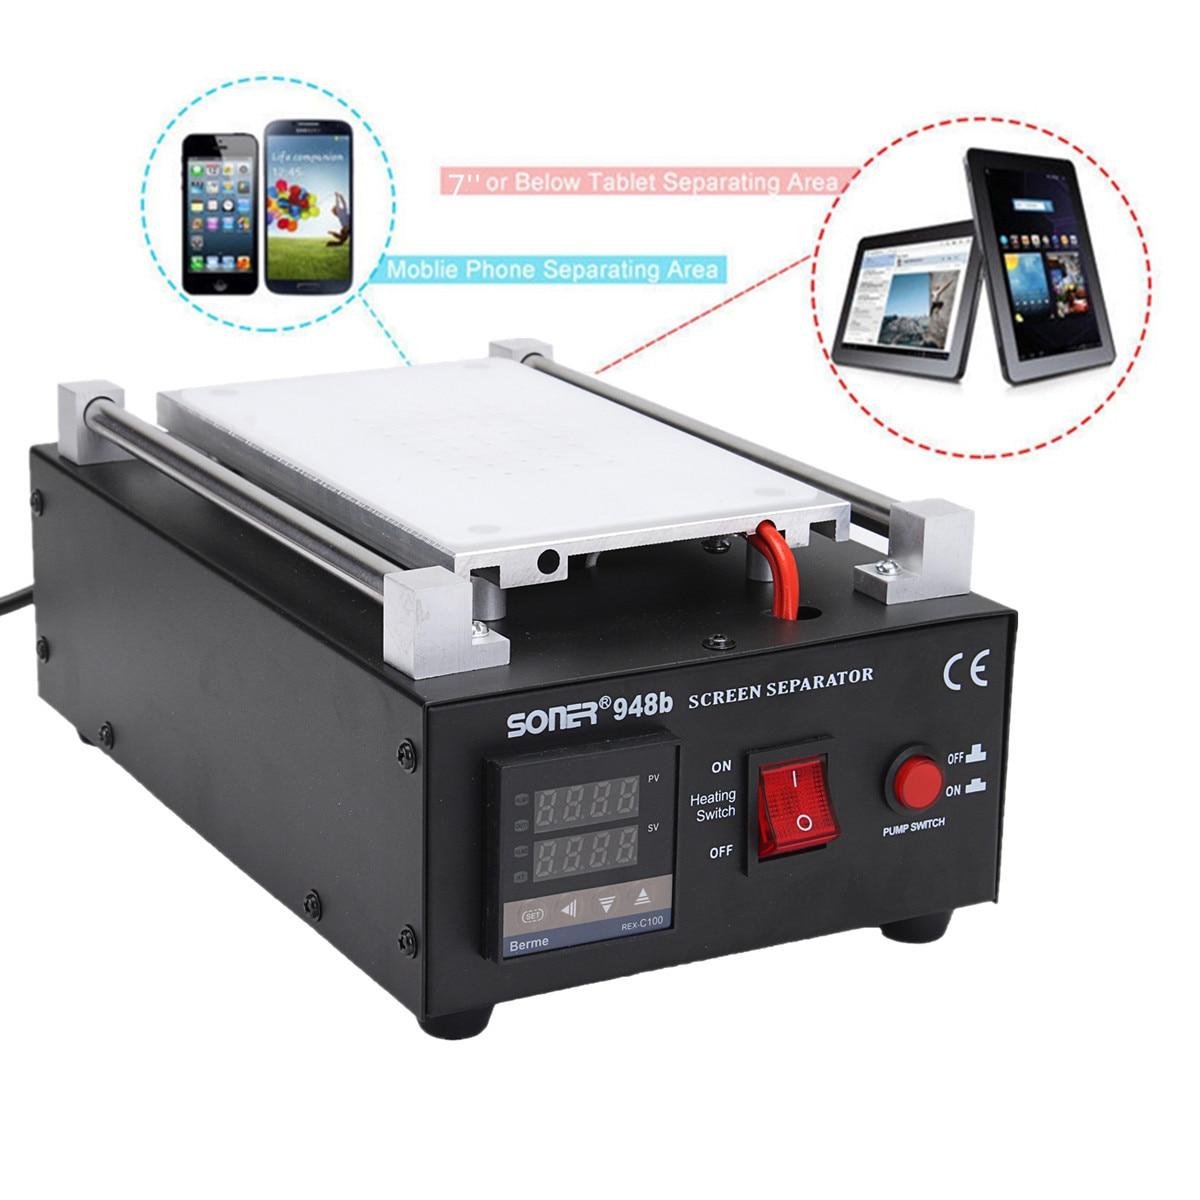 все цены на LCD Glass Different Cover Plate Vacuum Pump 7 Built-in Screen Separator Repair Machine Mobile Phone Auto Heating LED Display онлайн